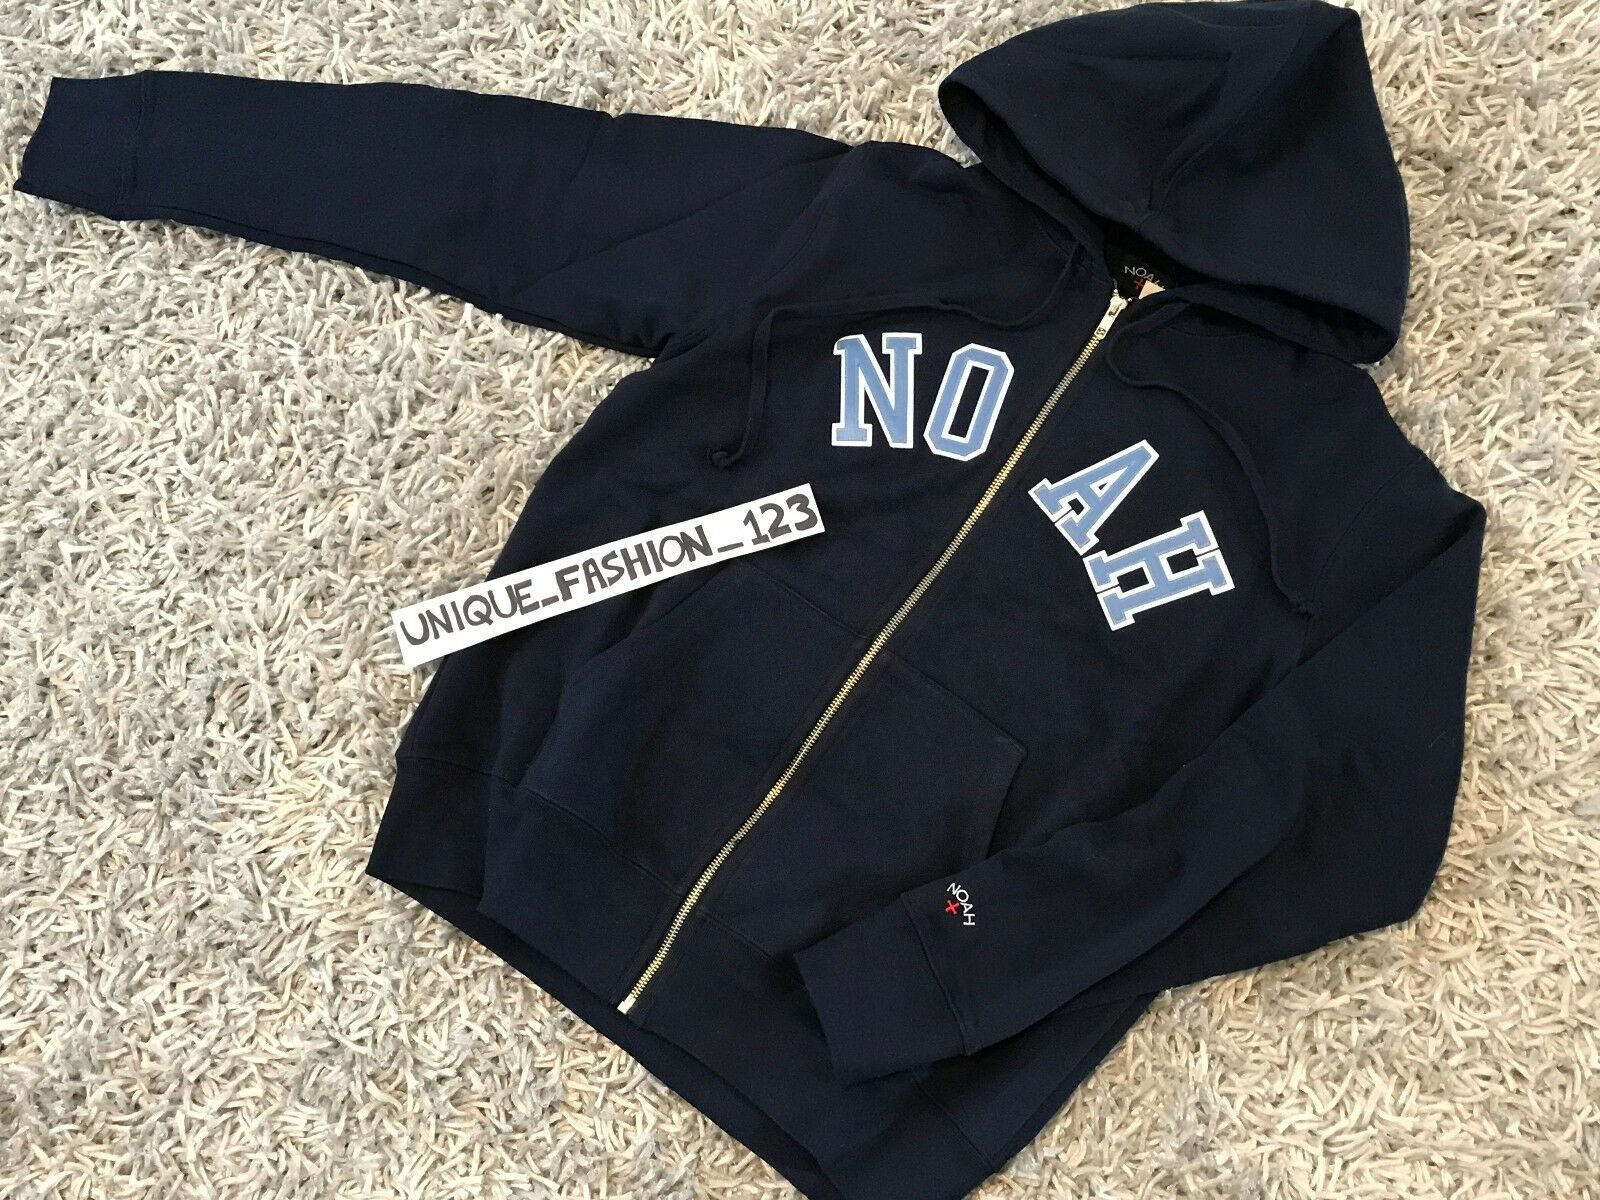 NOAH NYC SCRIPT ZIP UP HOODIE XL NAVY Blau HOODED SWEATSHIRT XLARGE SS17 NY  | Qualifizierte Herstellung